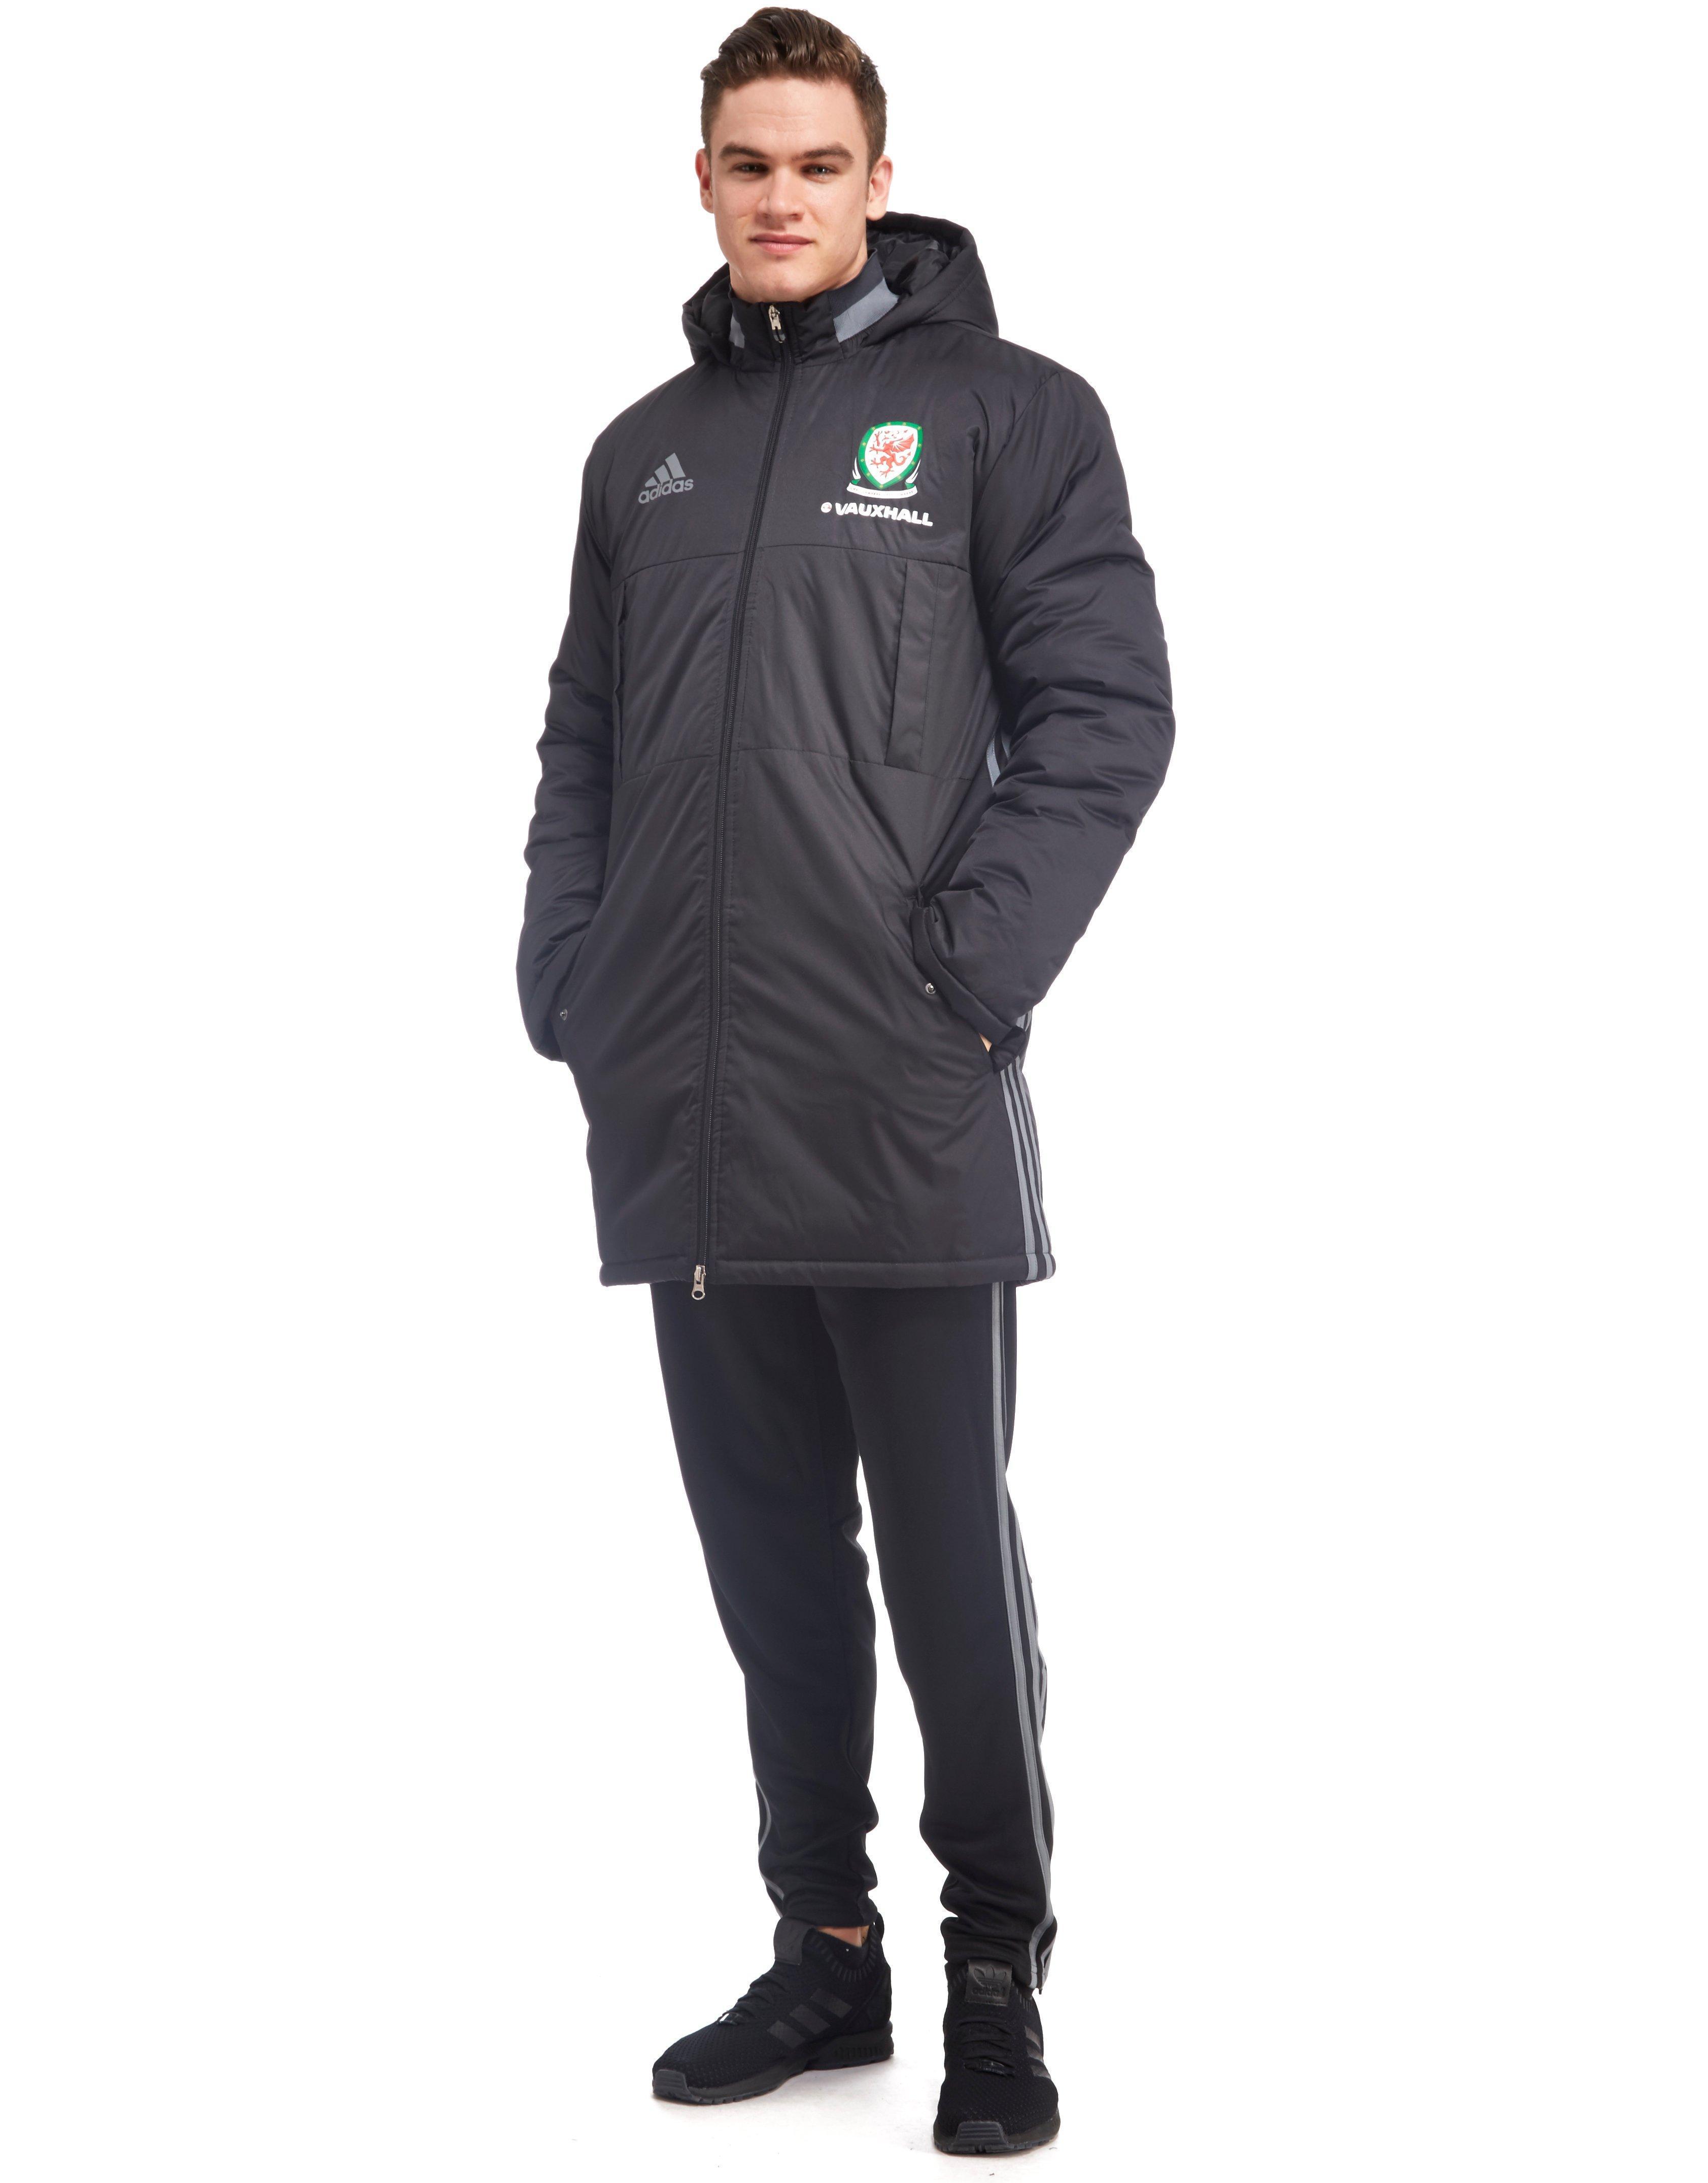 f34dde4c44d6 Lyst - adidas Originals Wales 2016 17 Stadium Jacket in Black for Men